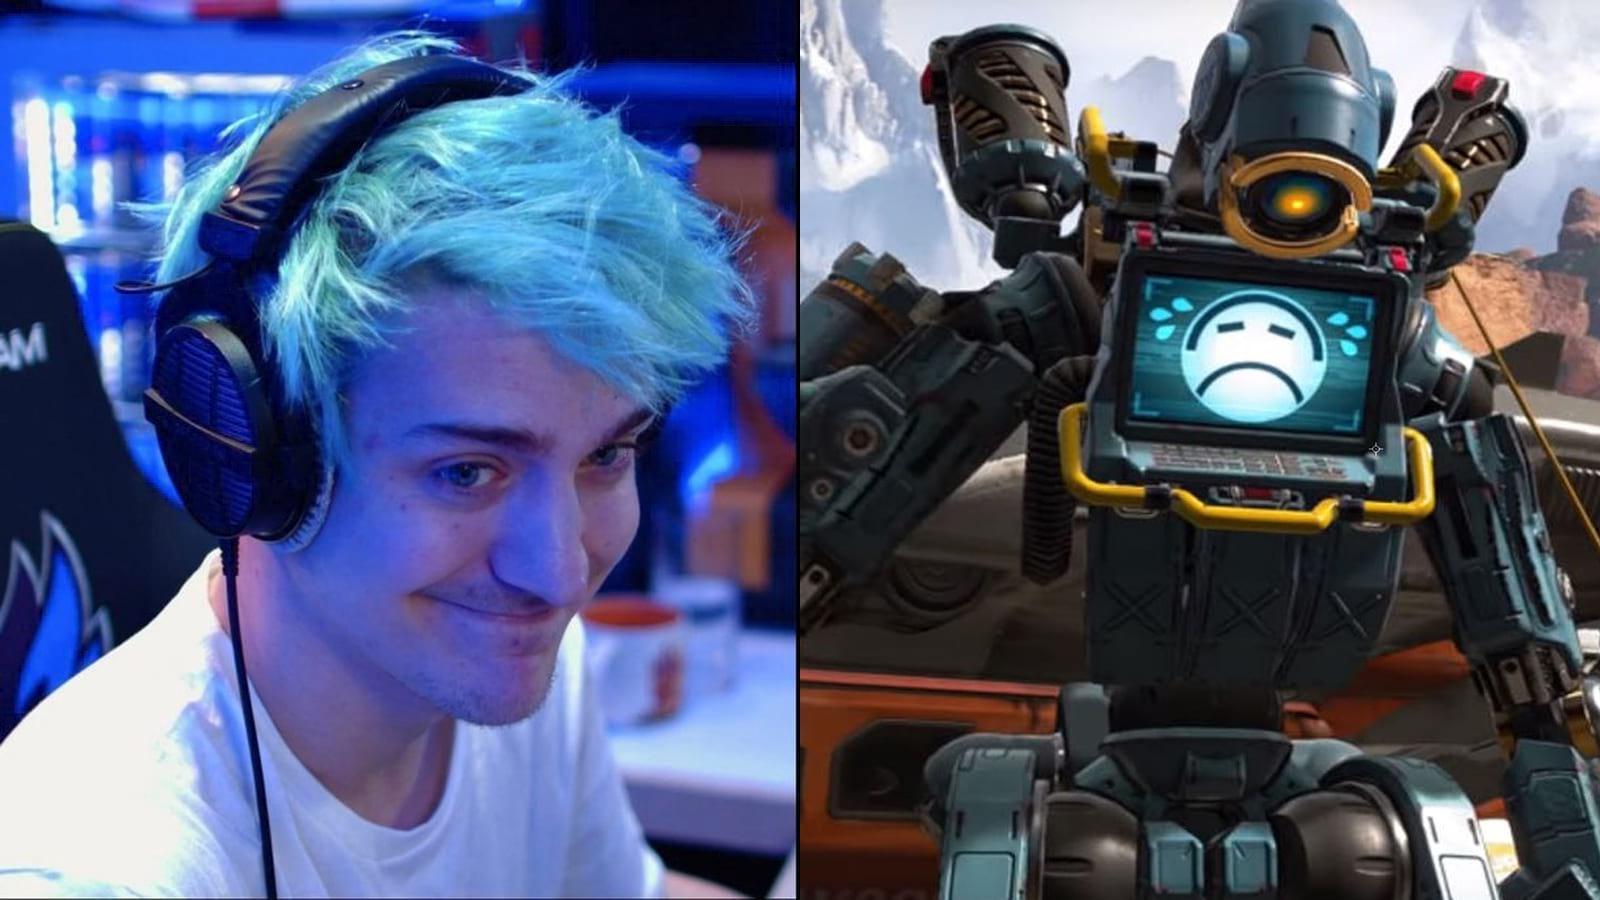 L: Ninja R: EA